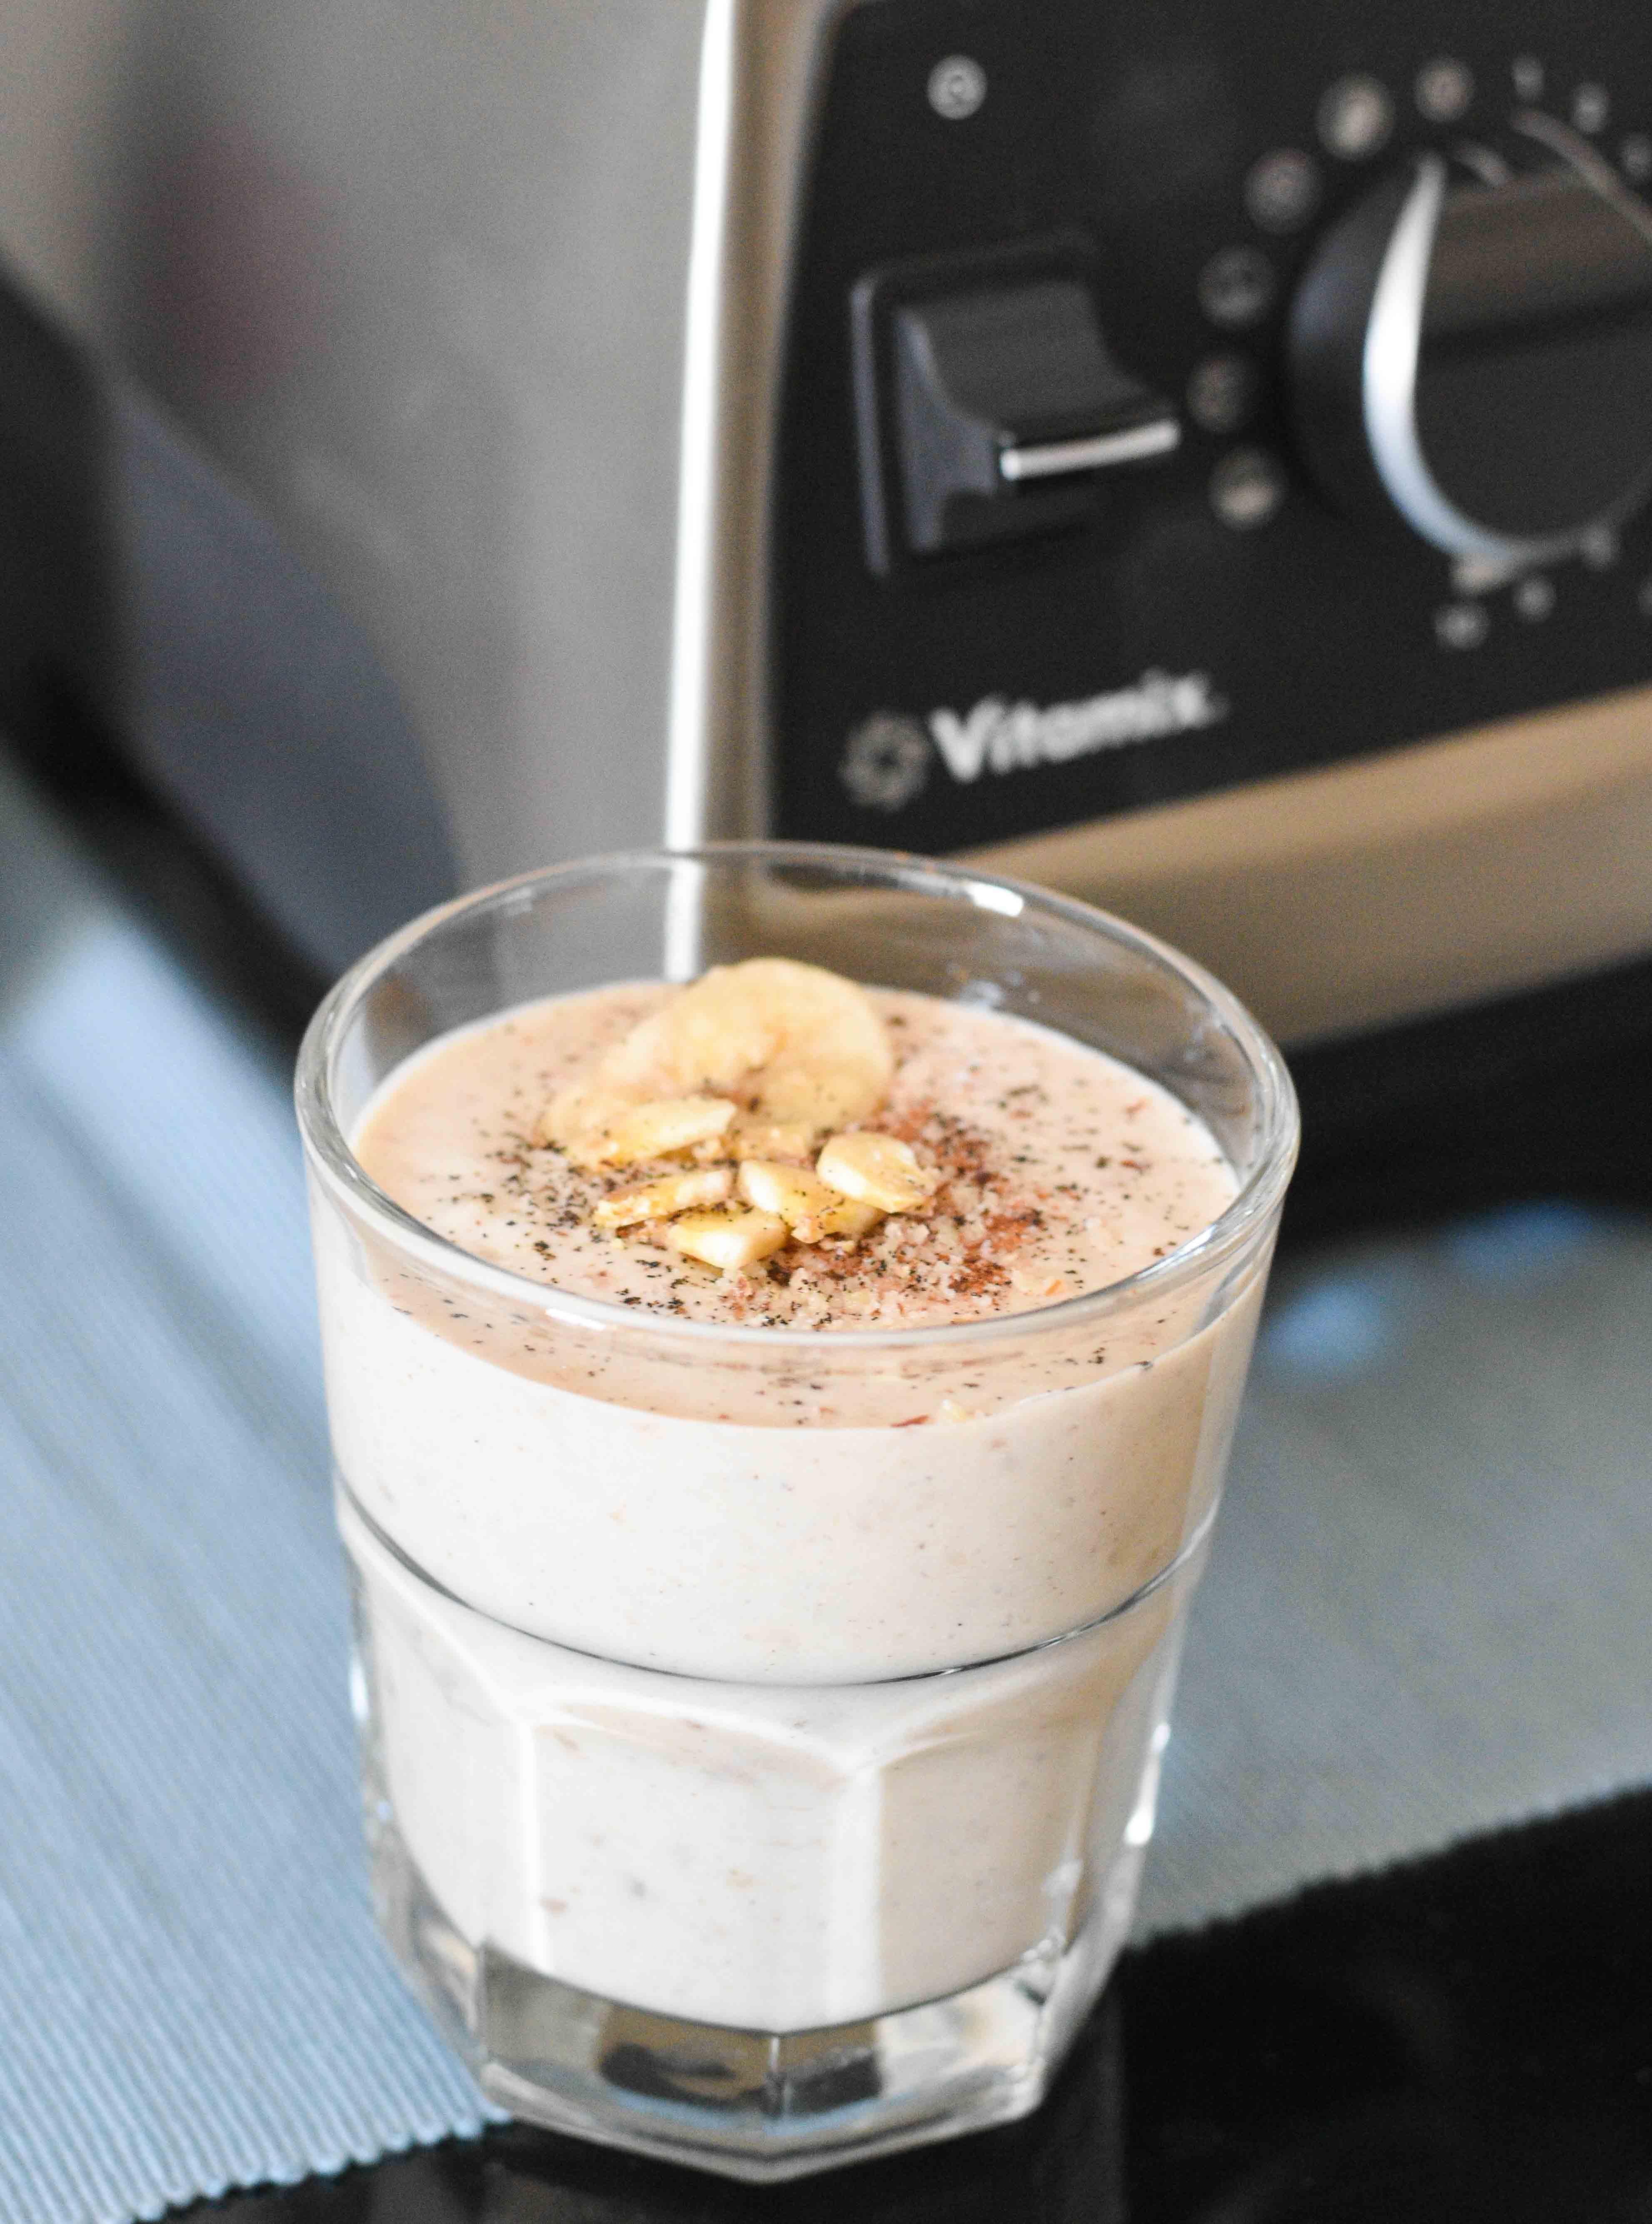 vitamix-lebkuchensmoothie-lebkuchen-smoothie-1